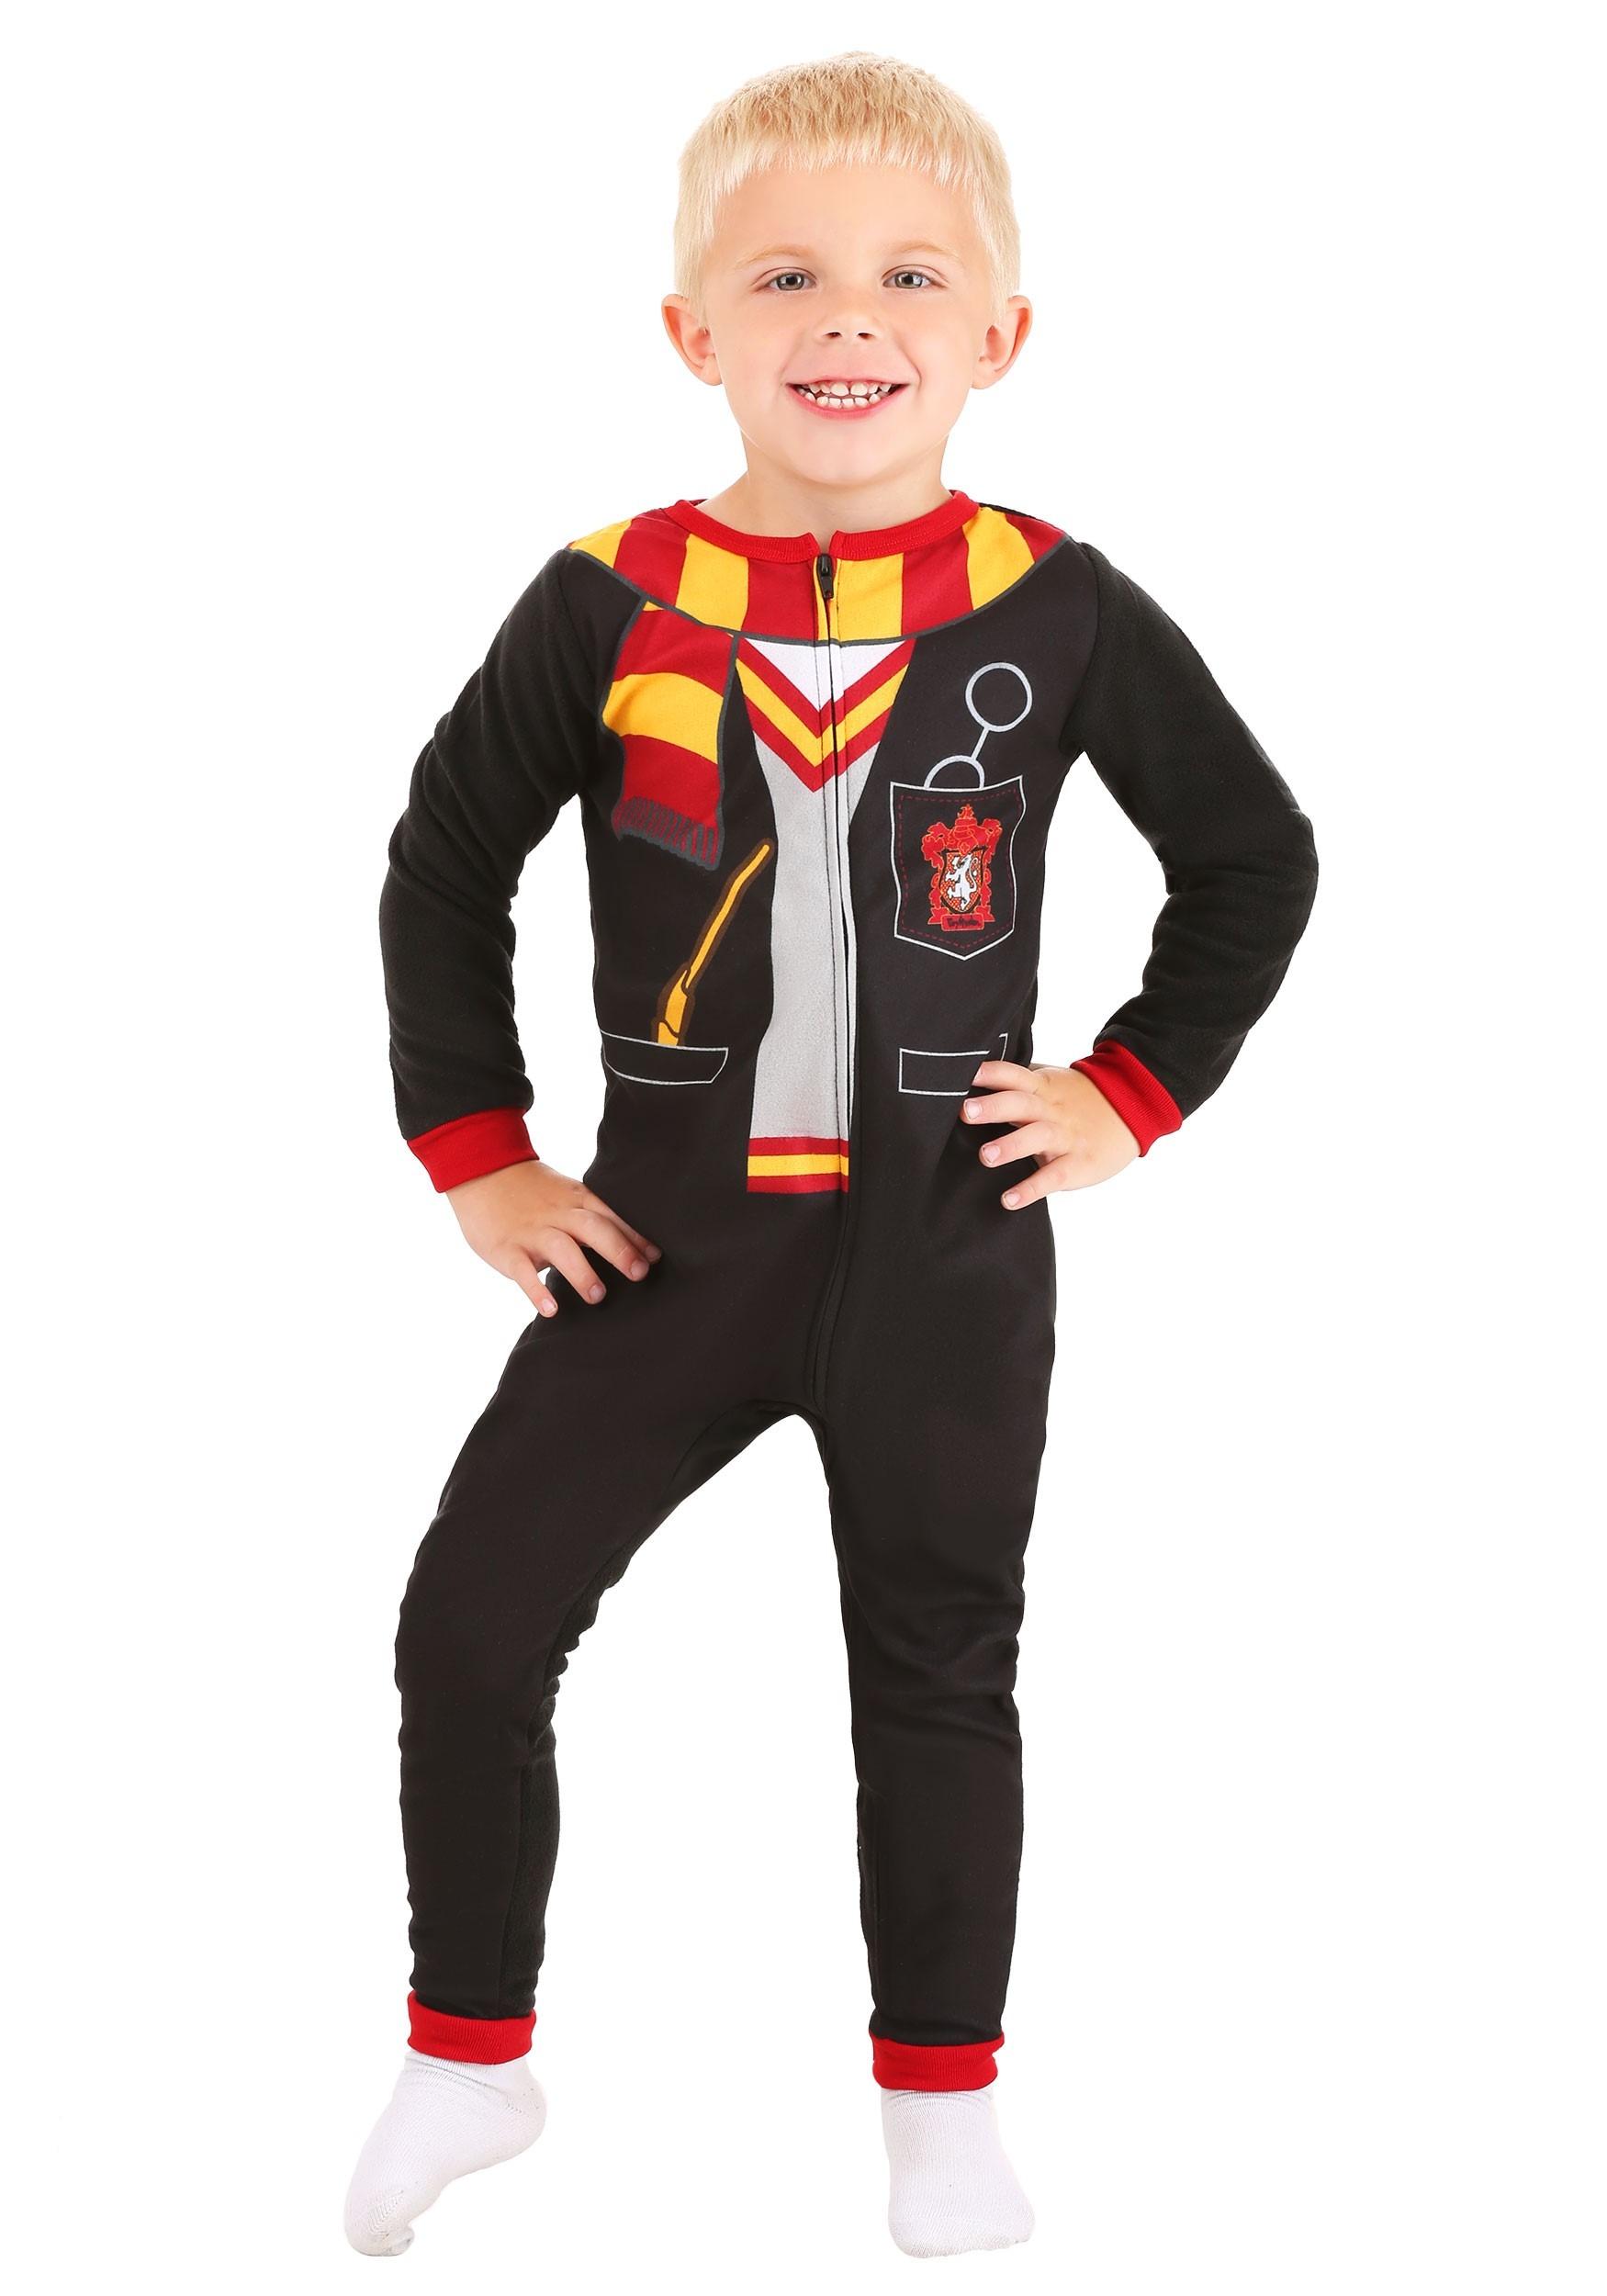 Harry Potter- Toddler Union Suit